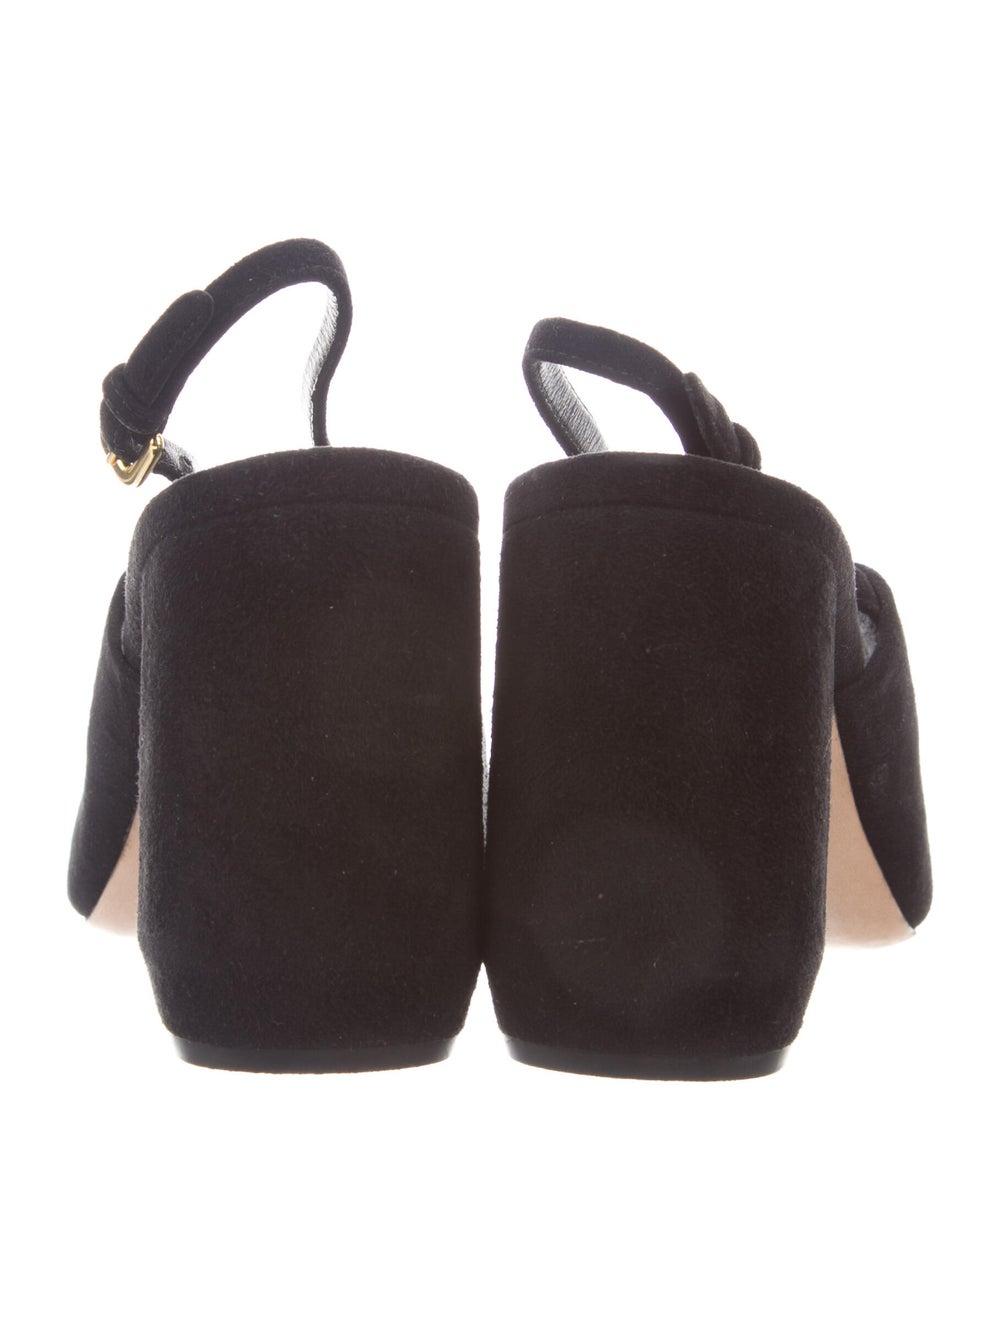 Prada Suede Slingback Sandals Black - image 4